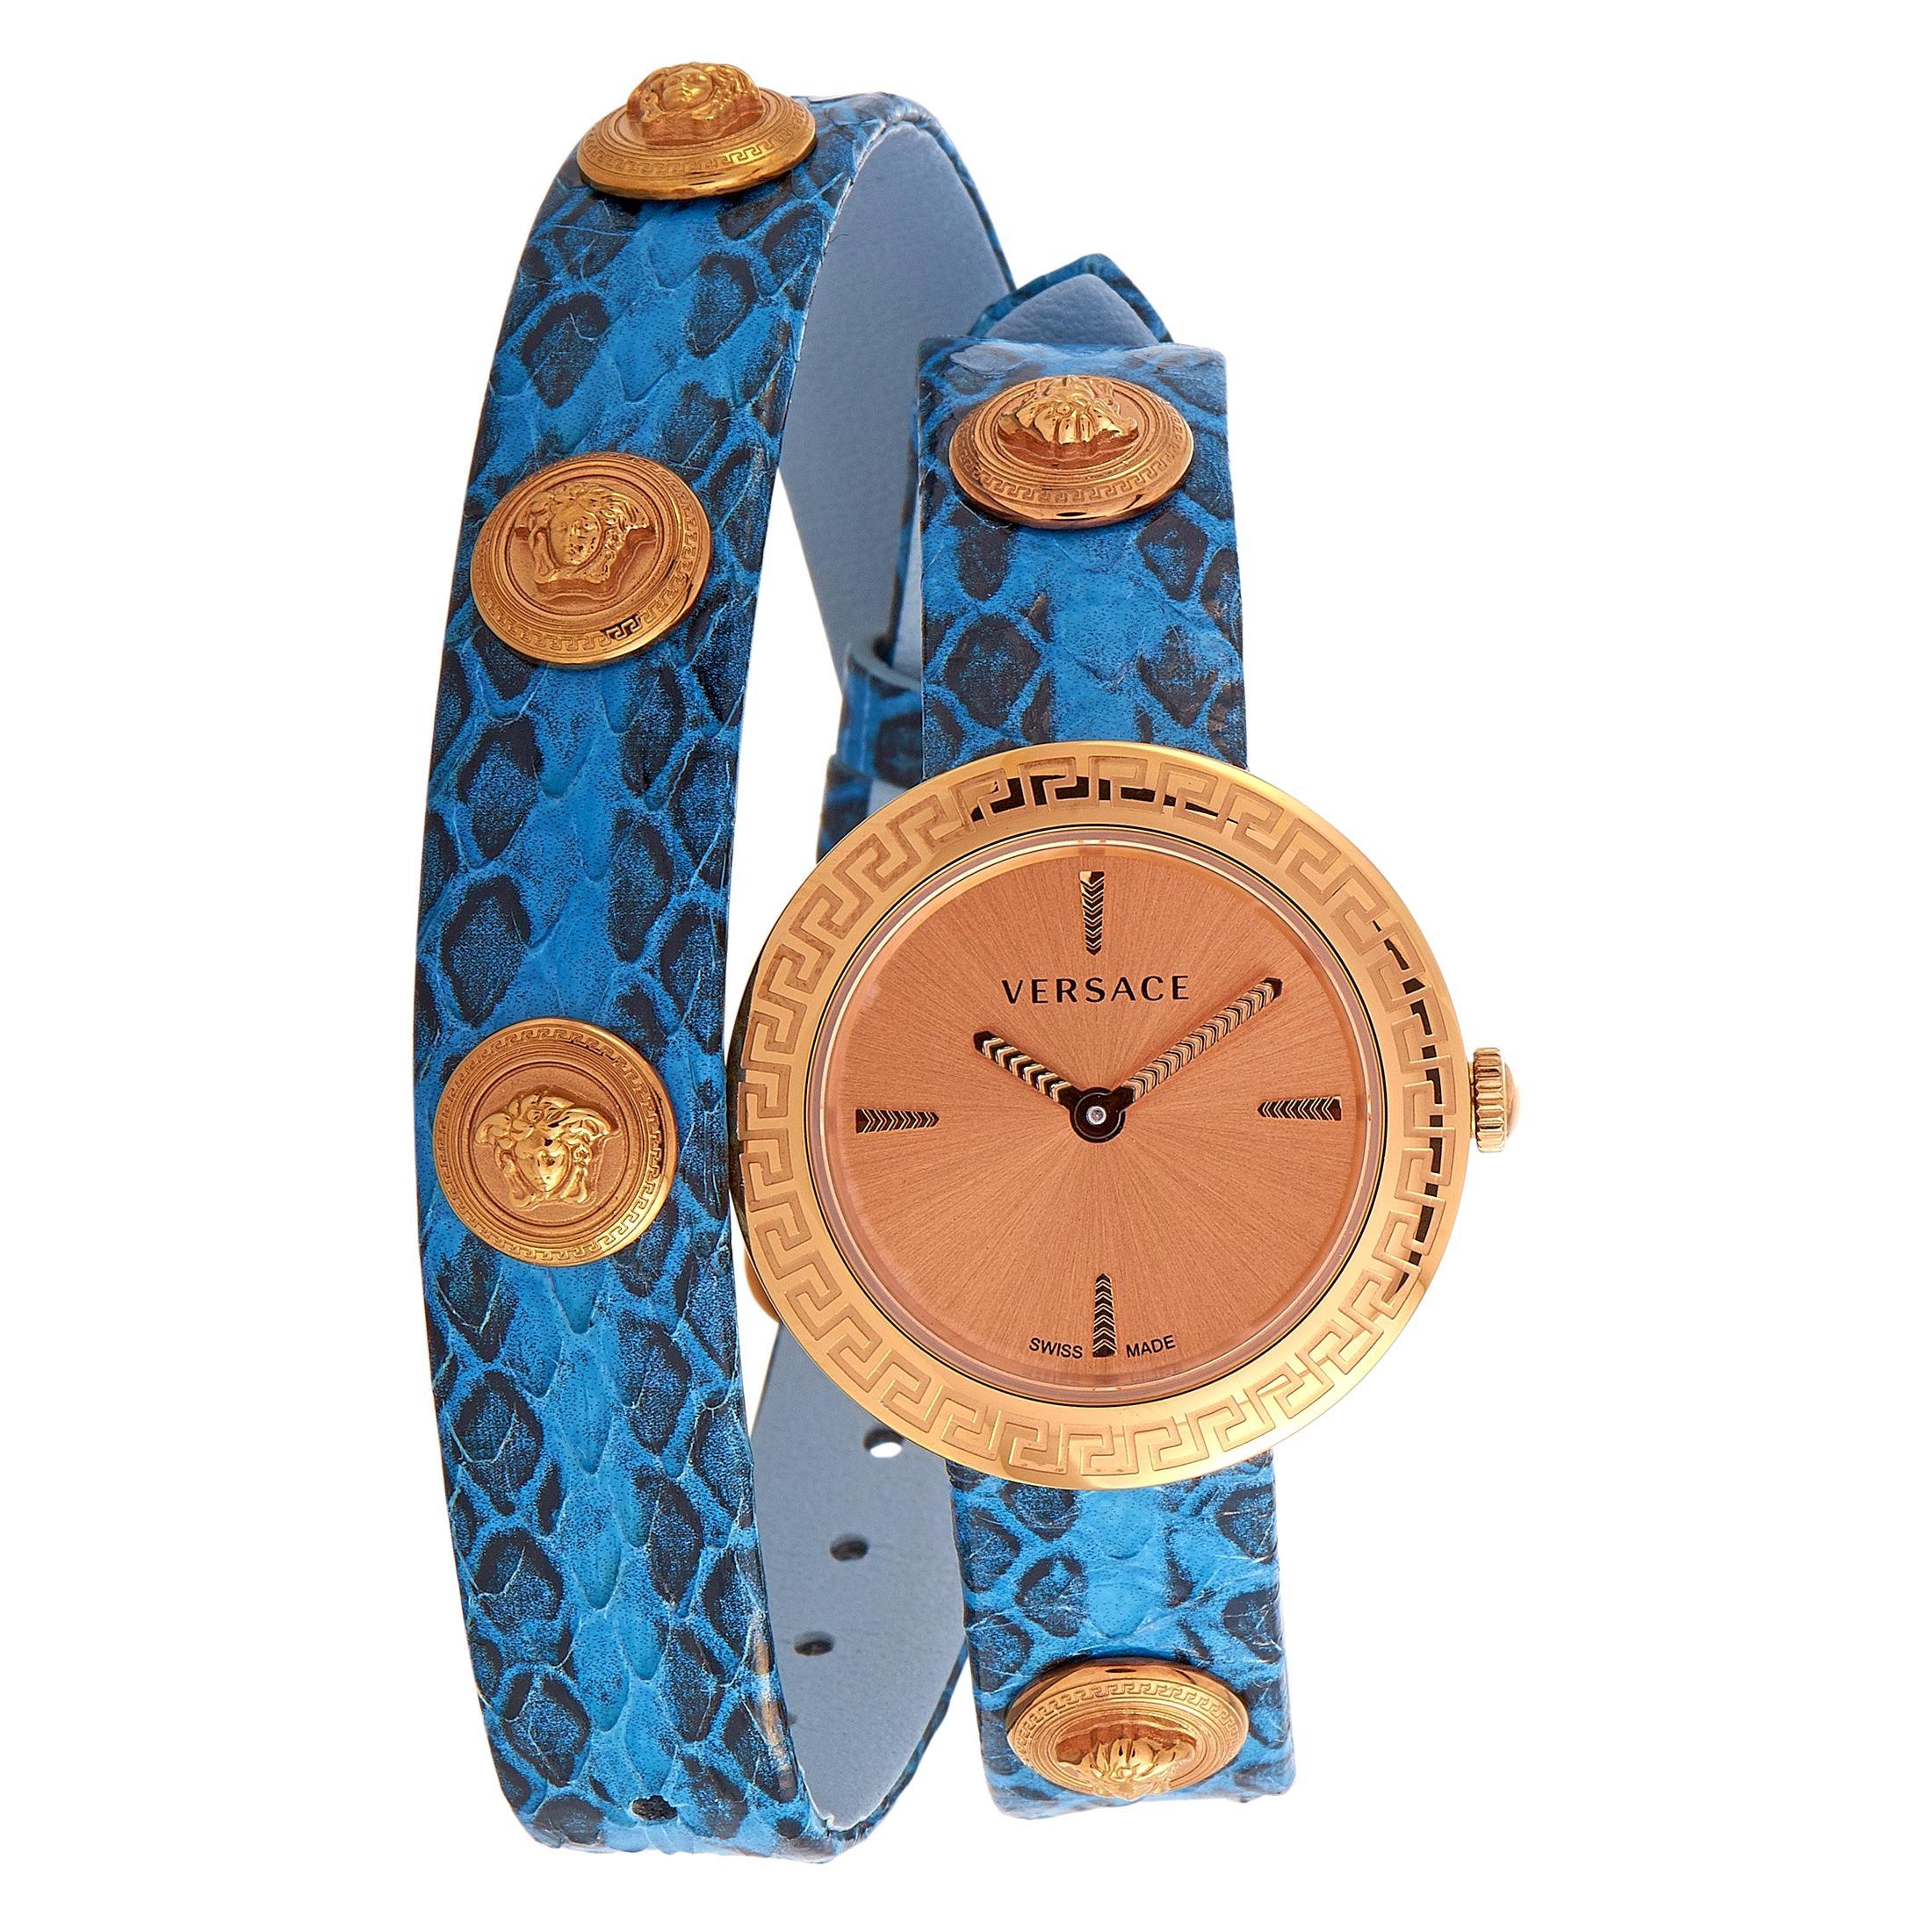 Versace Medusa Stud Icon Quartz Blue Leather Watch VERF00418